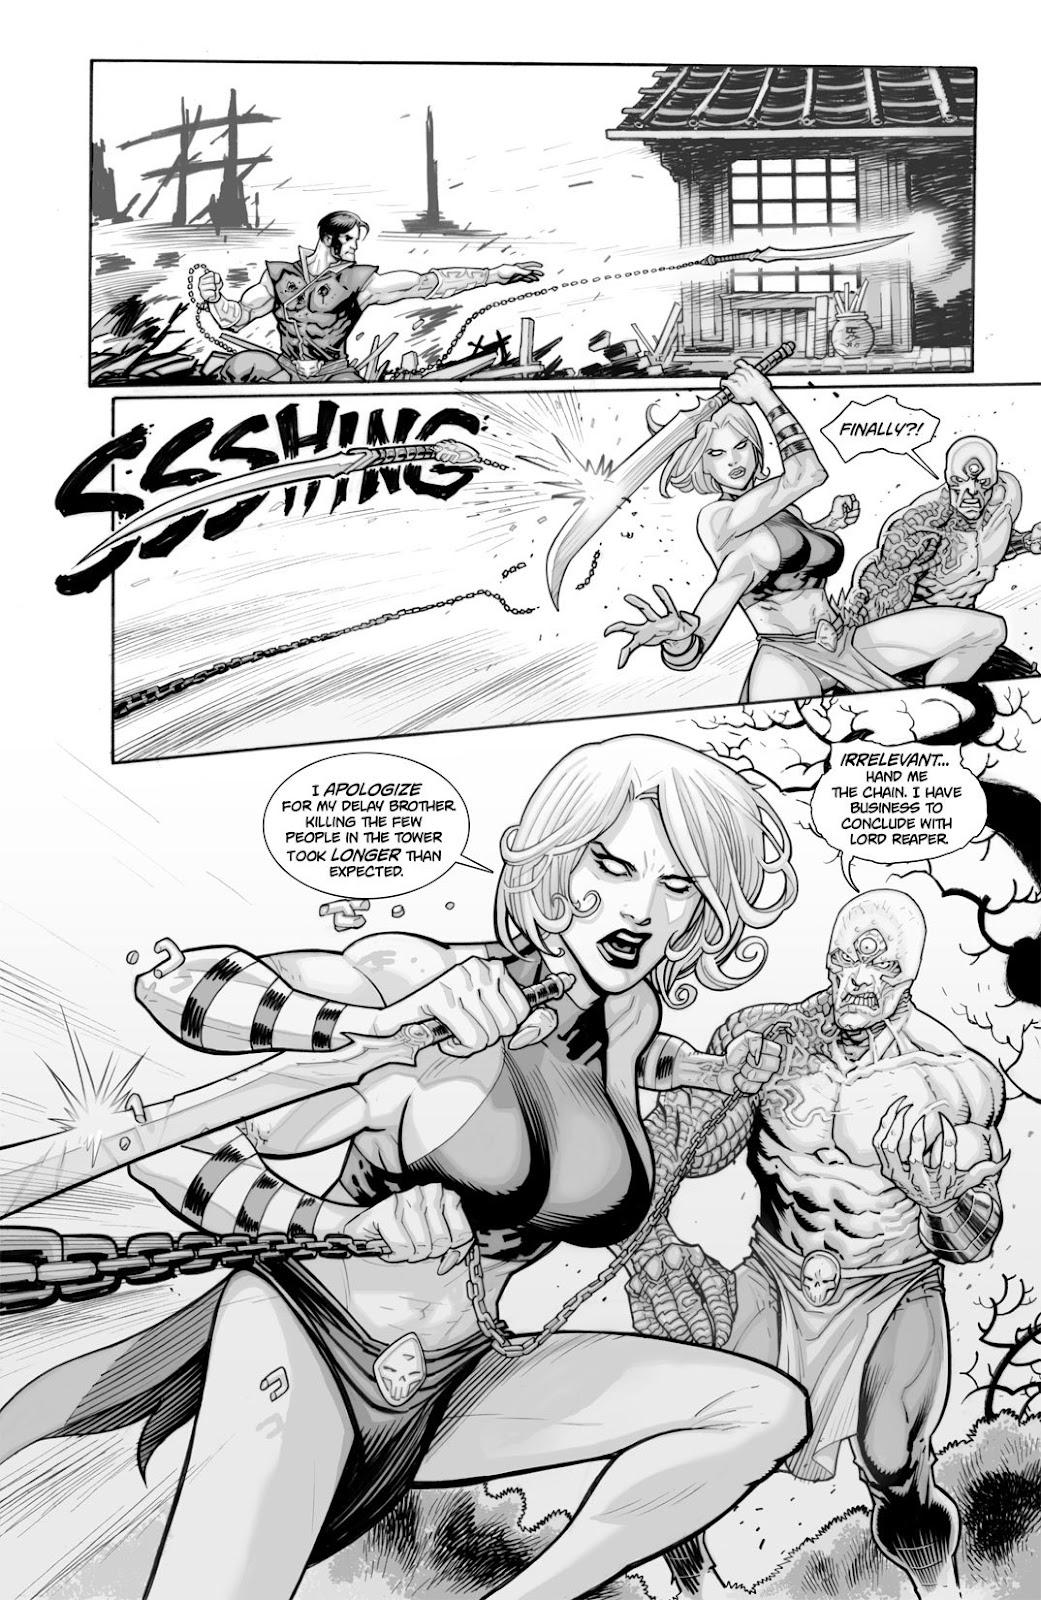 Read online Reaper comic -  Issue #2 - 28